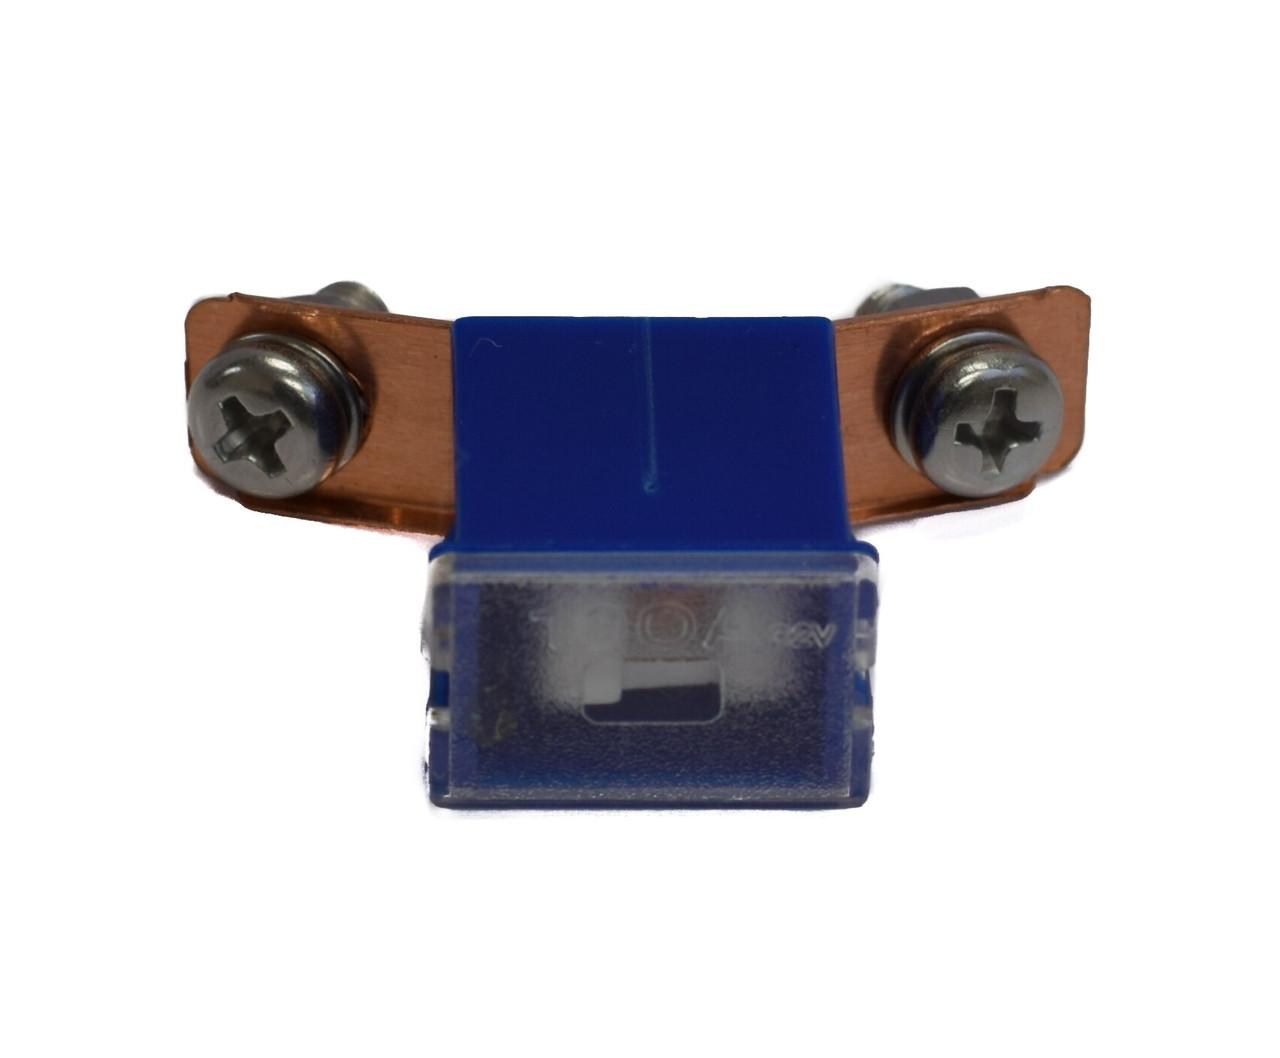 Raion Power RBC7 100A Fuse Includes Nuts & Bolts For APC SmartUPS SUA1000XL